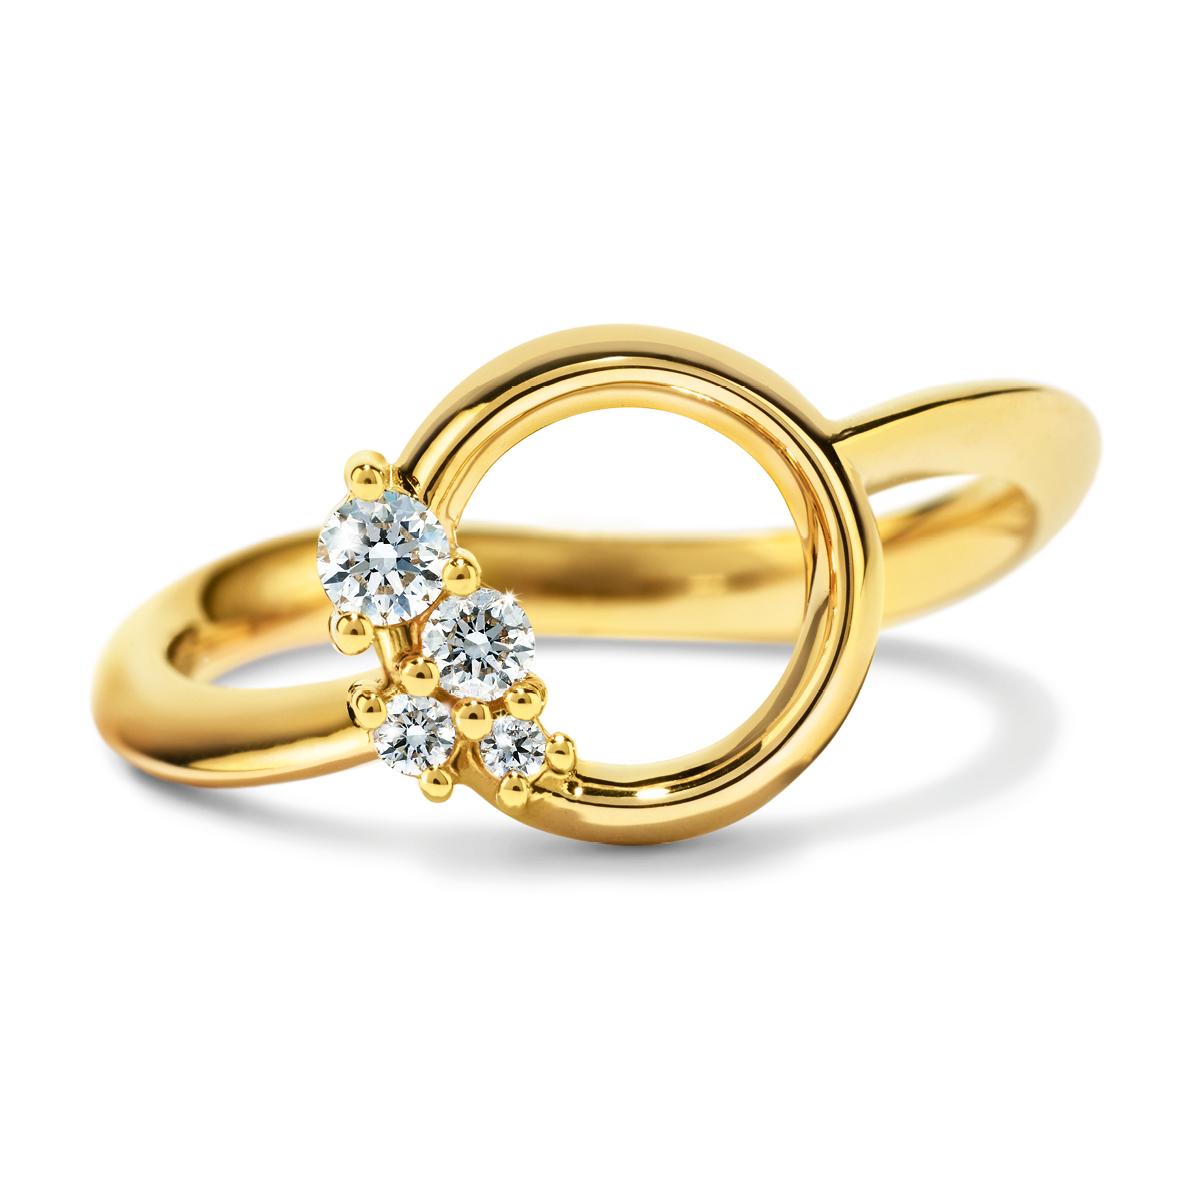 si Tratamiento Preferencial romántico  Atelier Swarovski Glacial Wave Ring, 18K Yellow Gold | Joes Jewelry St  Maarten